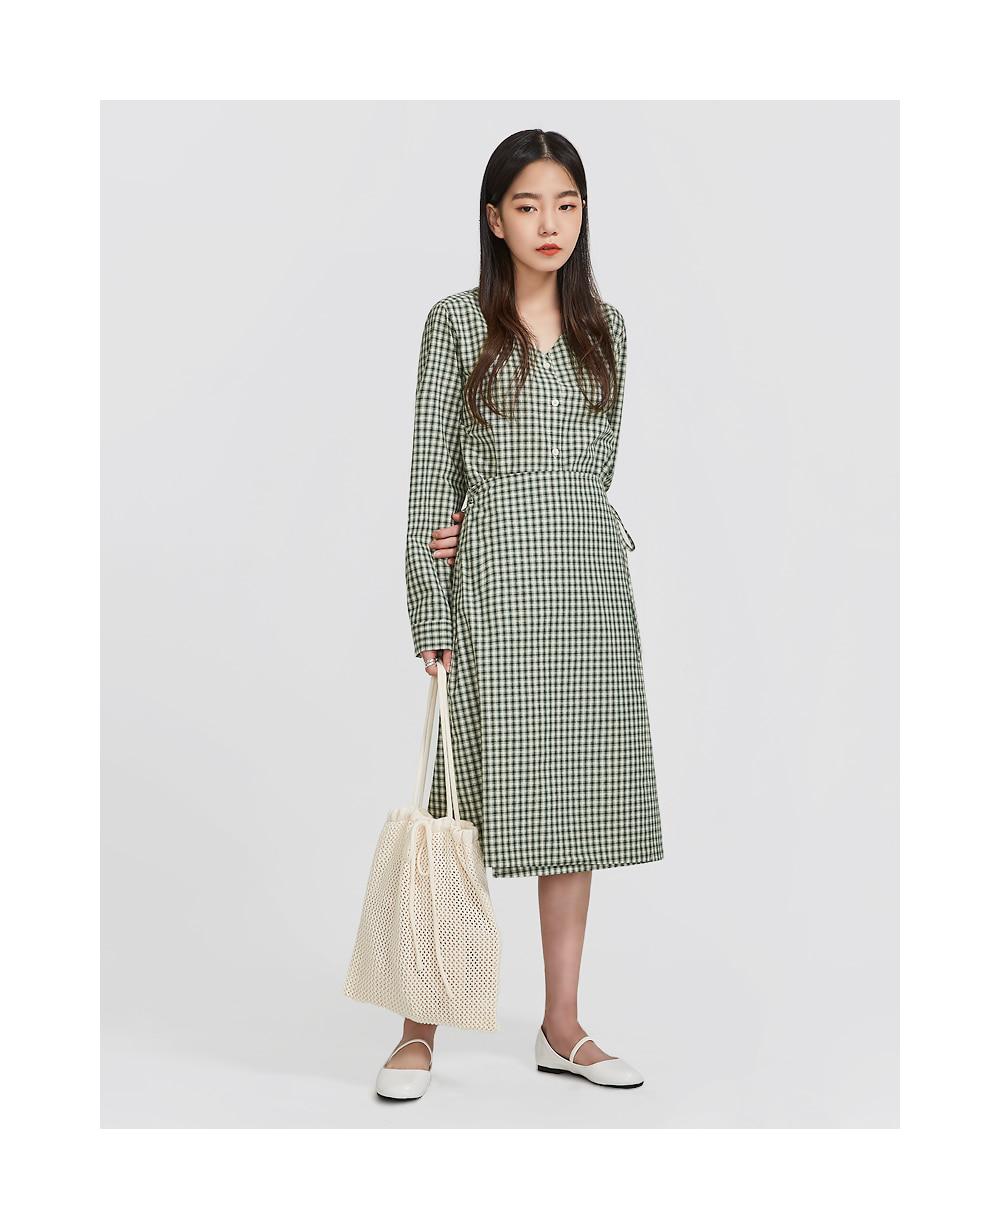 AIN - Korean Fashion - #Kfashion - Various Knit Bag